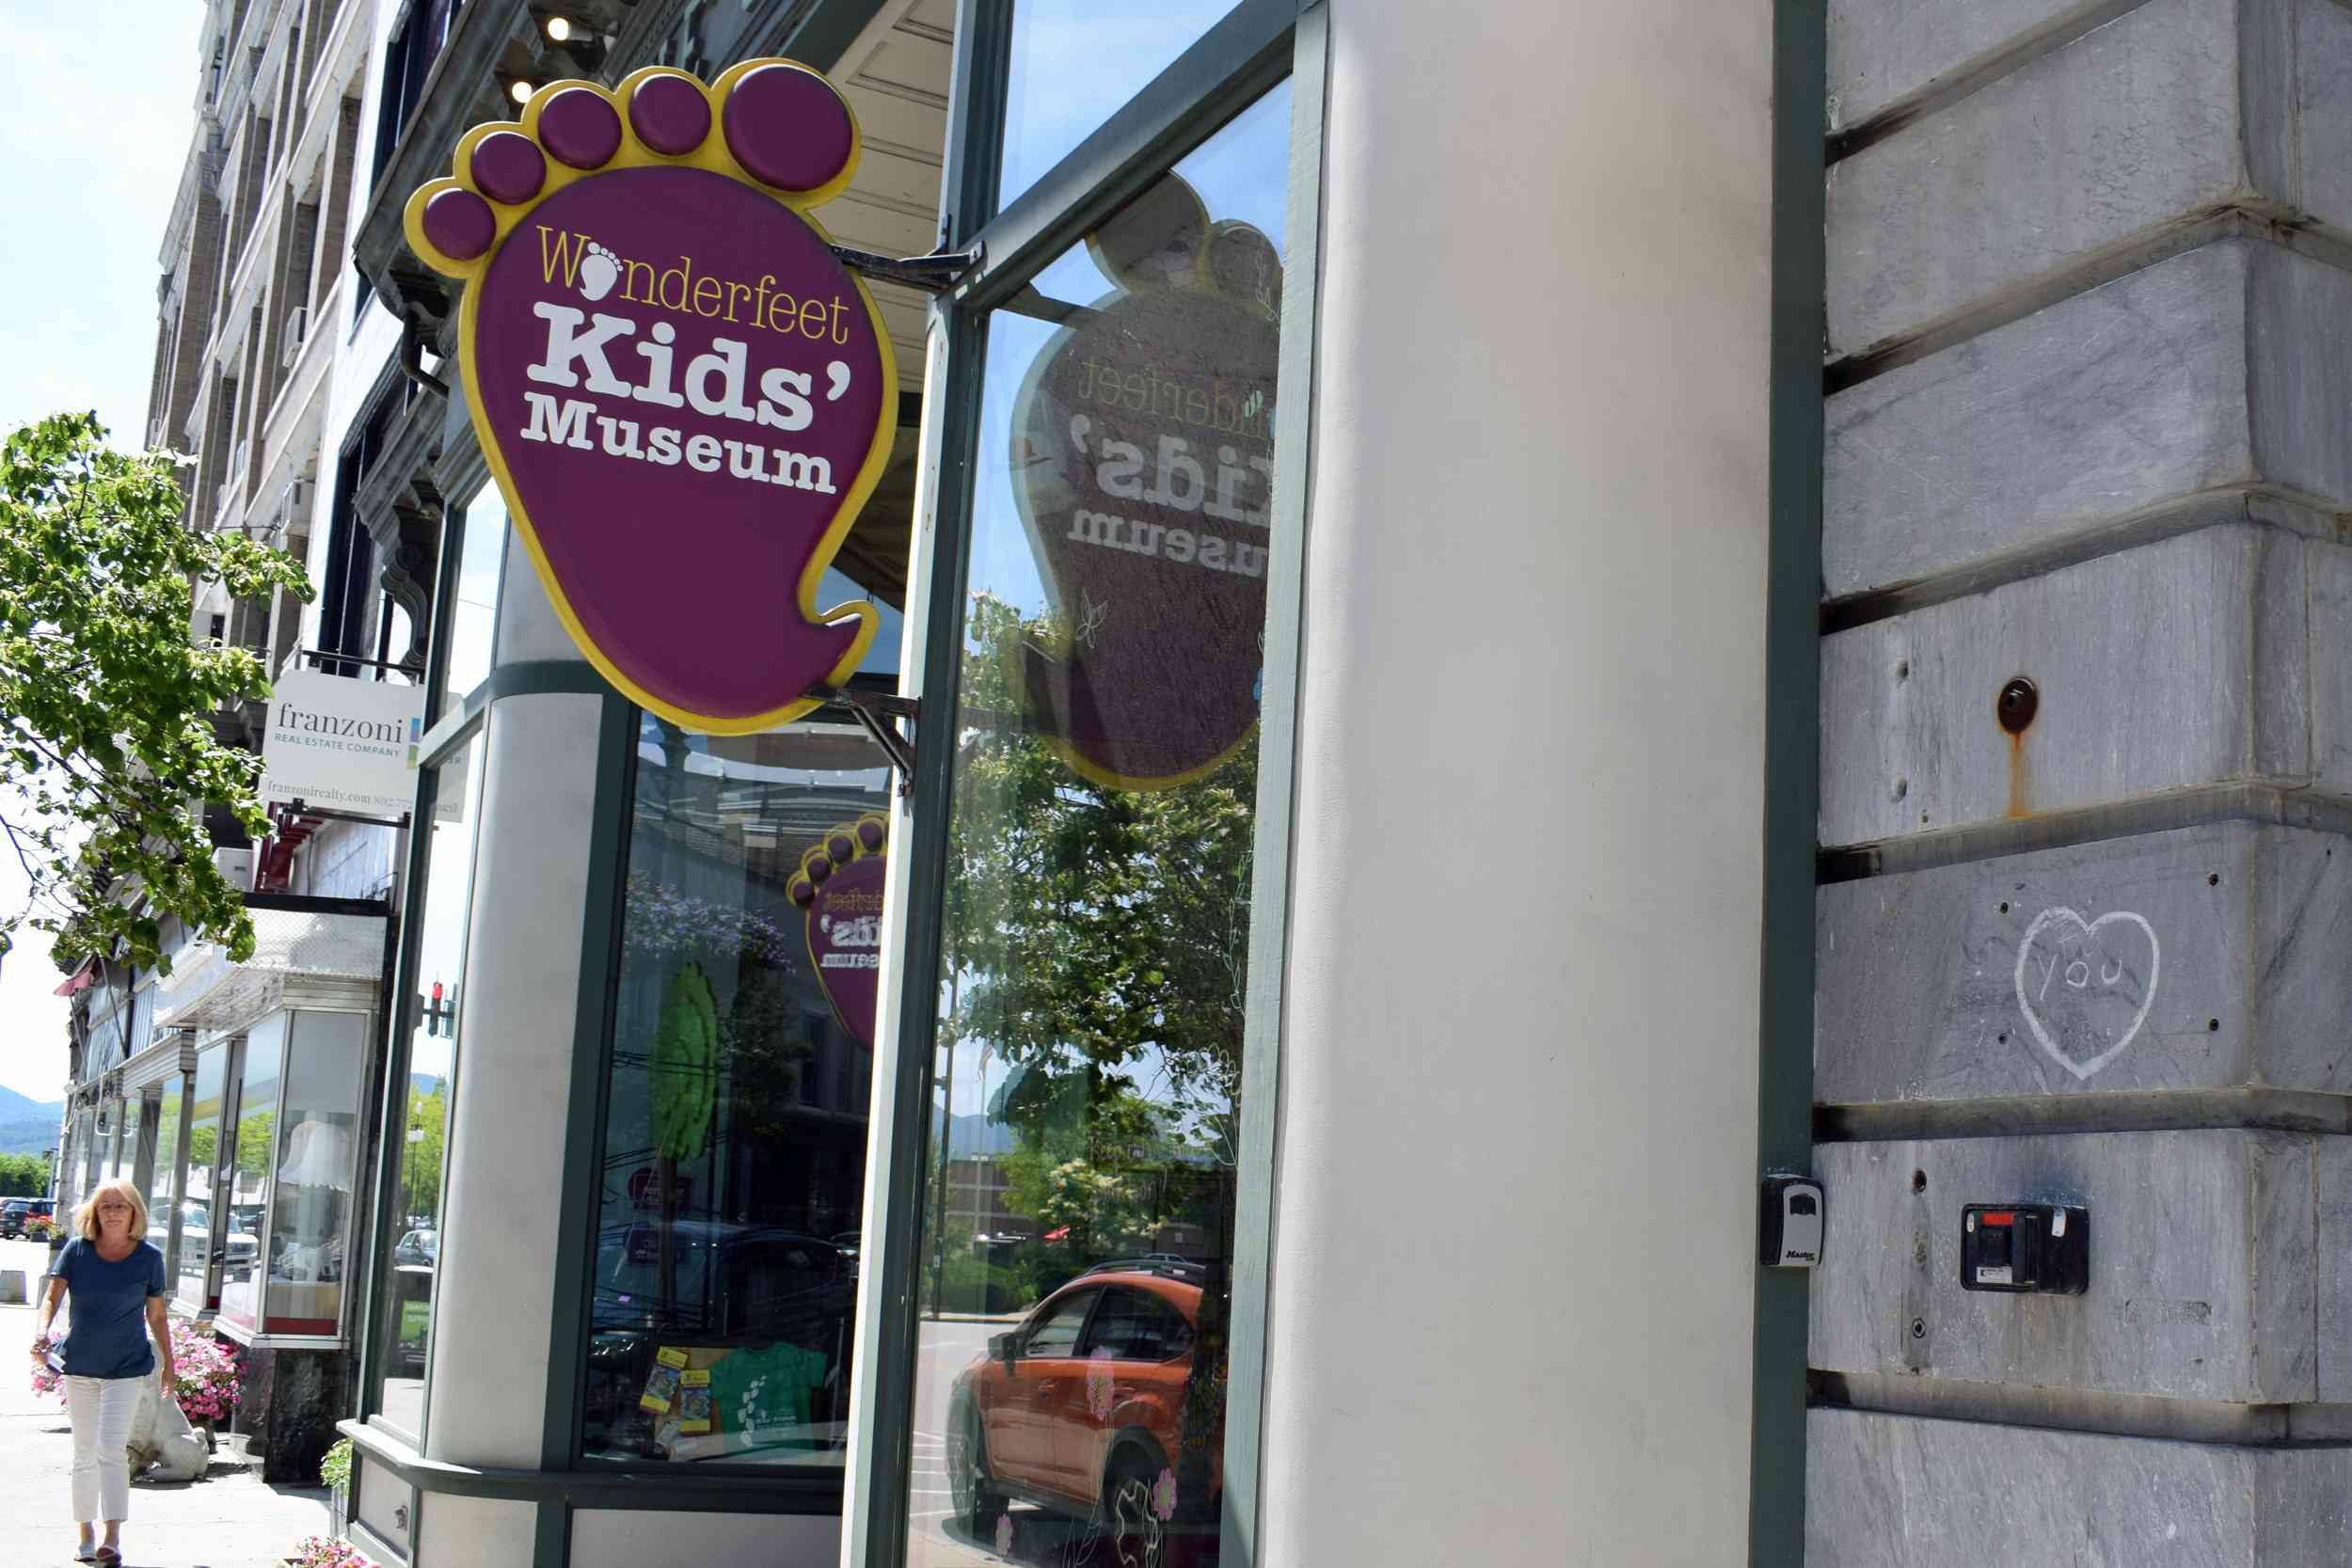 Wonderfeet Kids Museum in Downtown Rutland